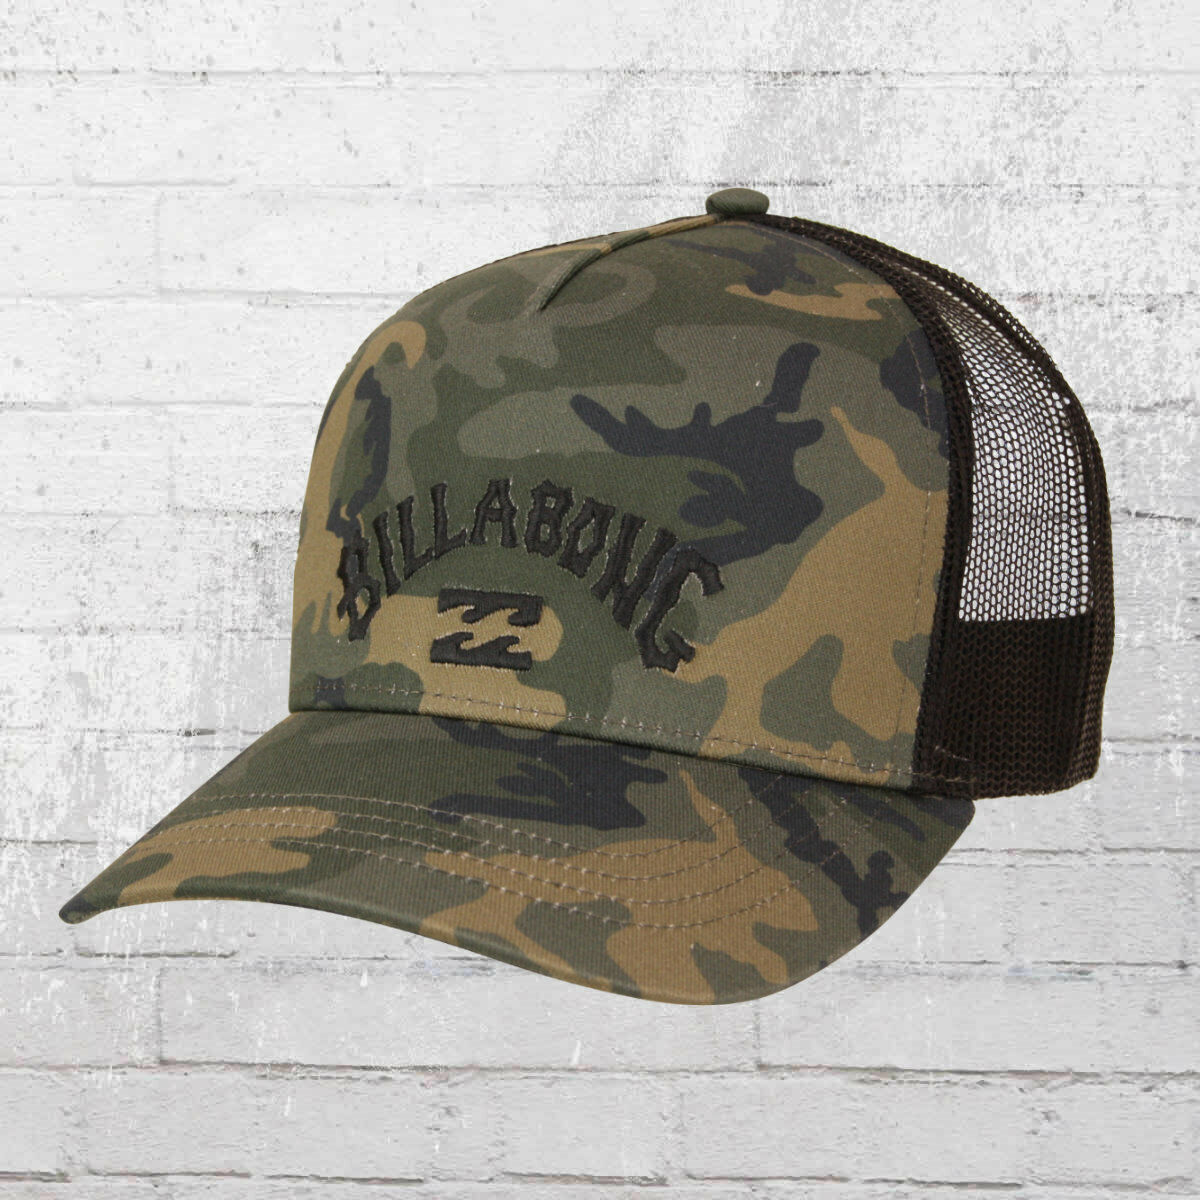 Billabong Flatwall Trucker Cap camouflage Kappe Mütze Haube Basecap Cappy Hat